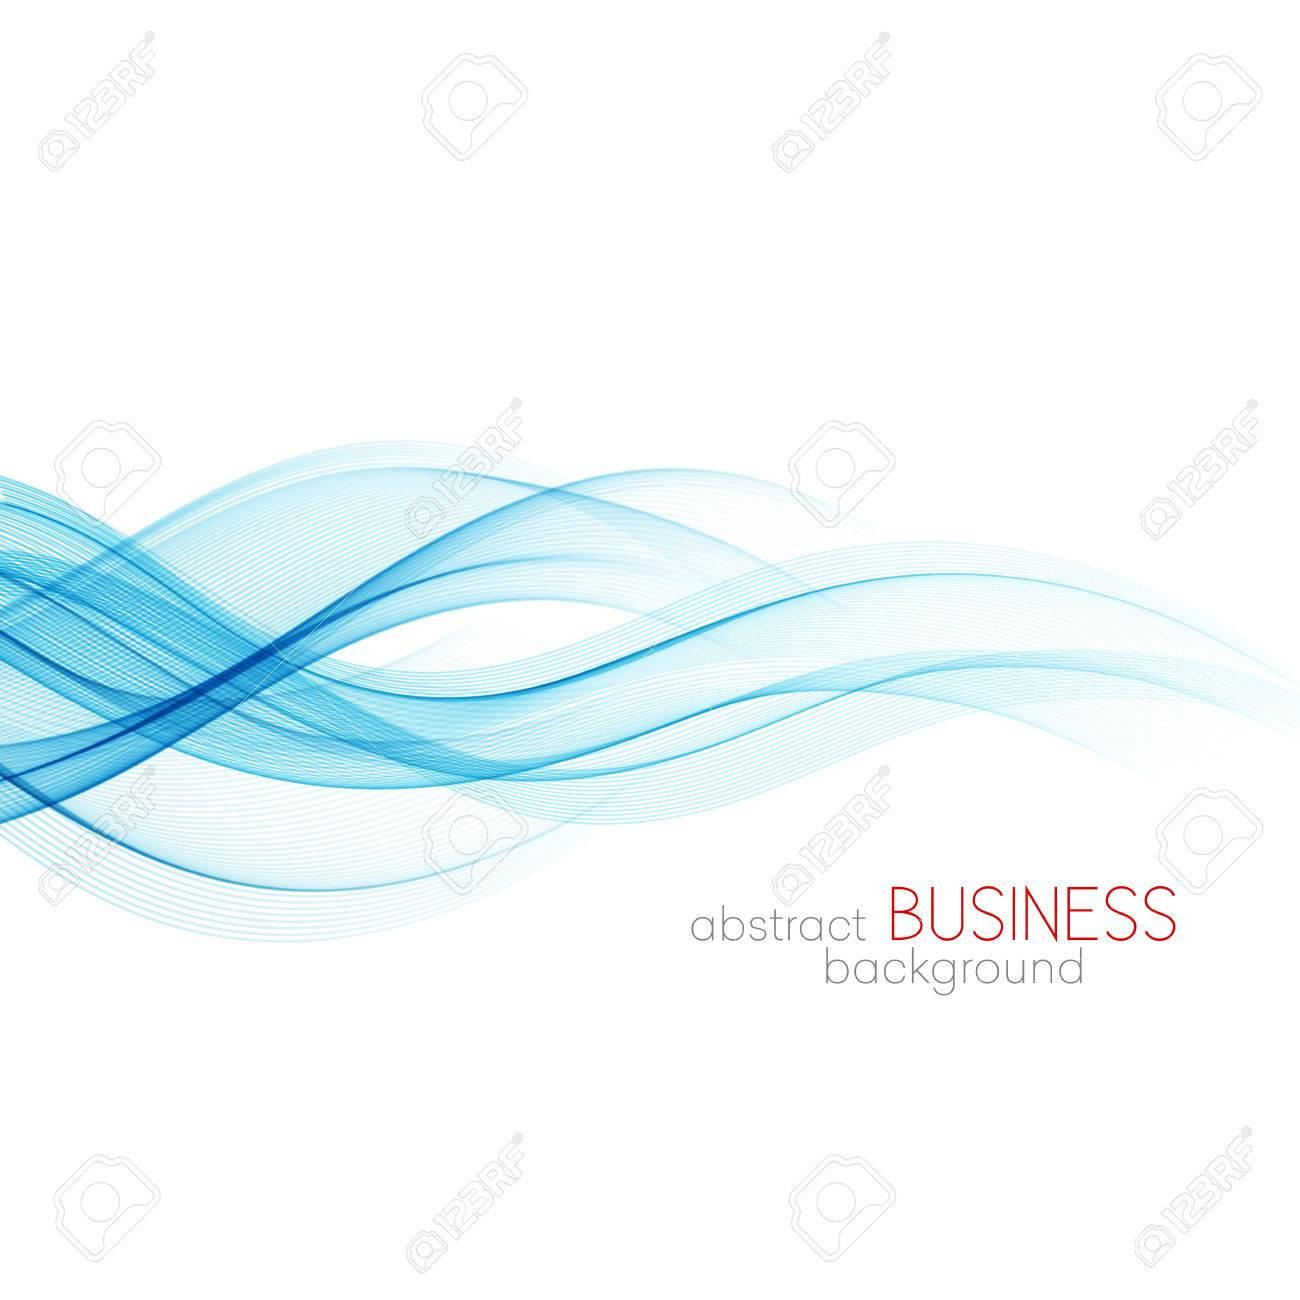 Abstract vector background, blue transparent waved lines for brochure, website, flyer design. Blue smoke wave. Blue wavy background - 56343181